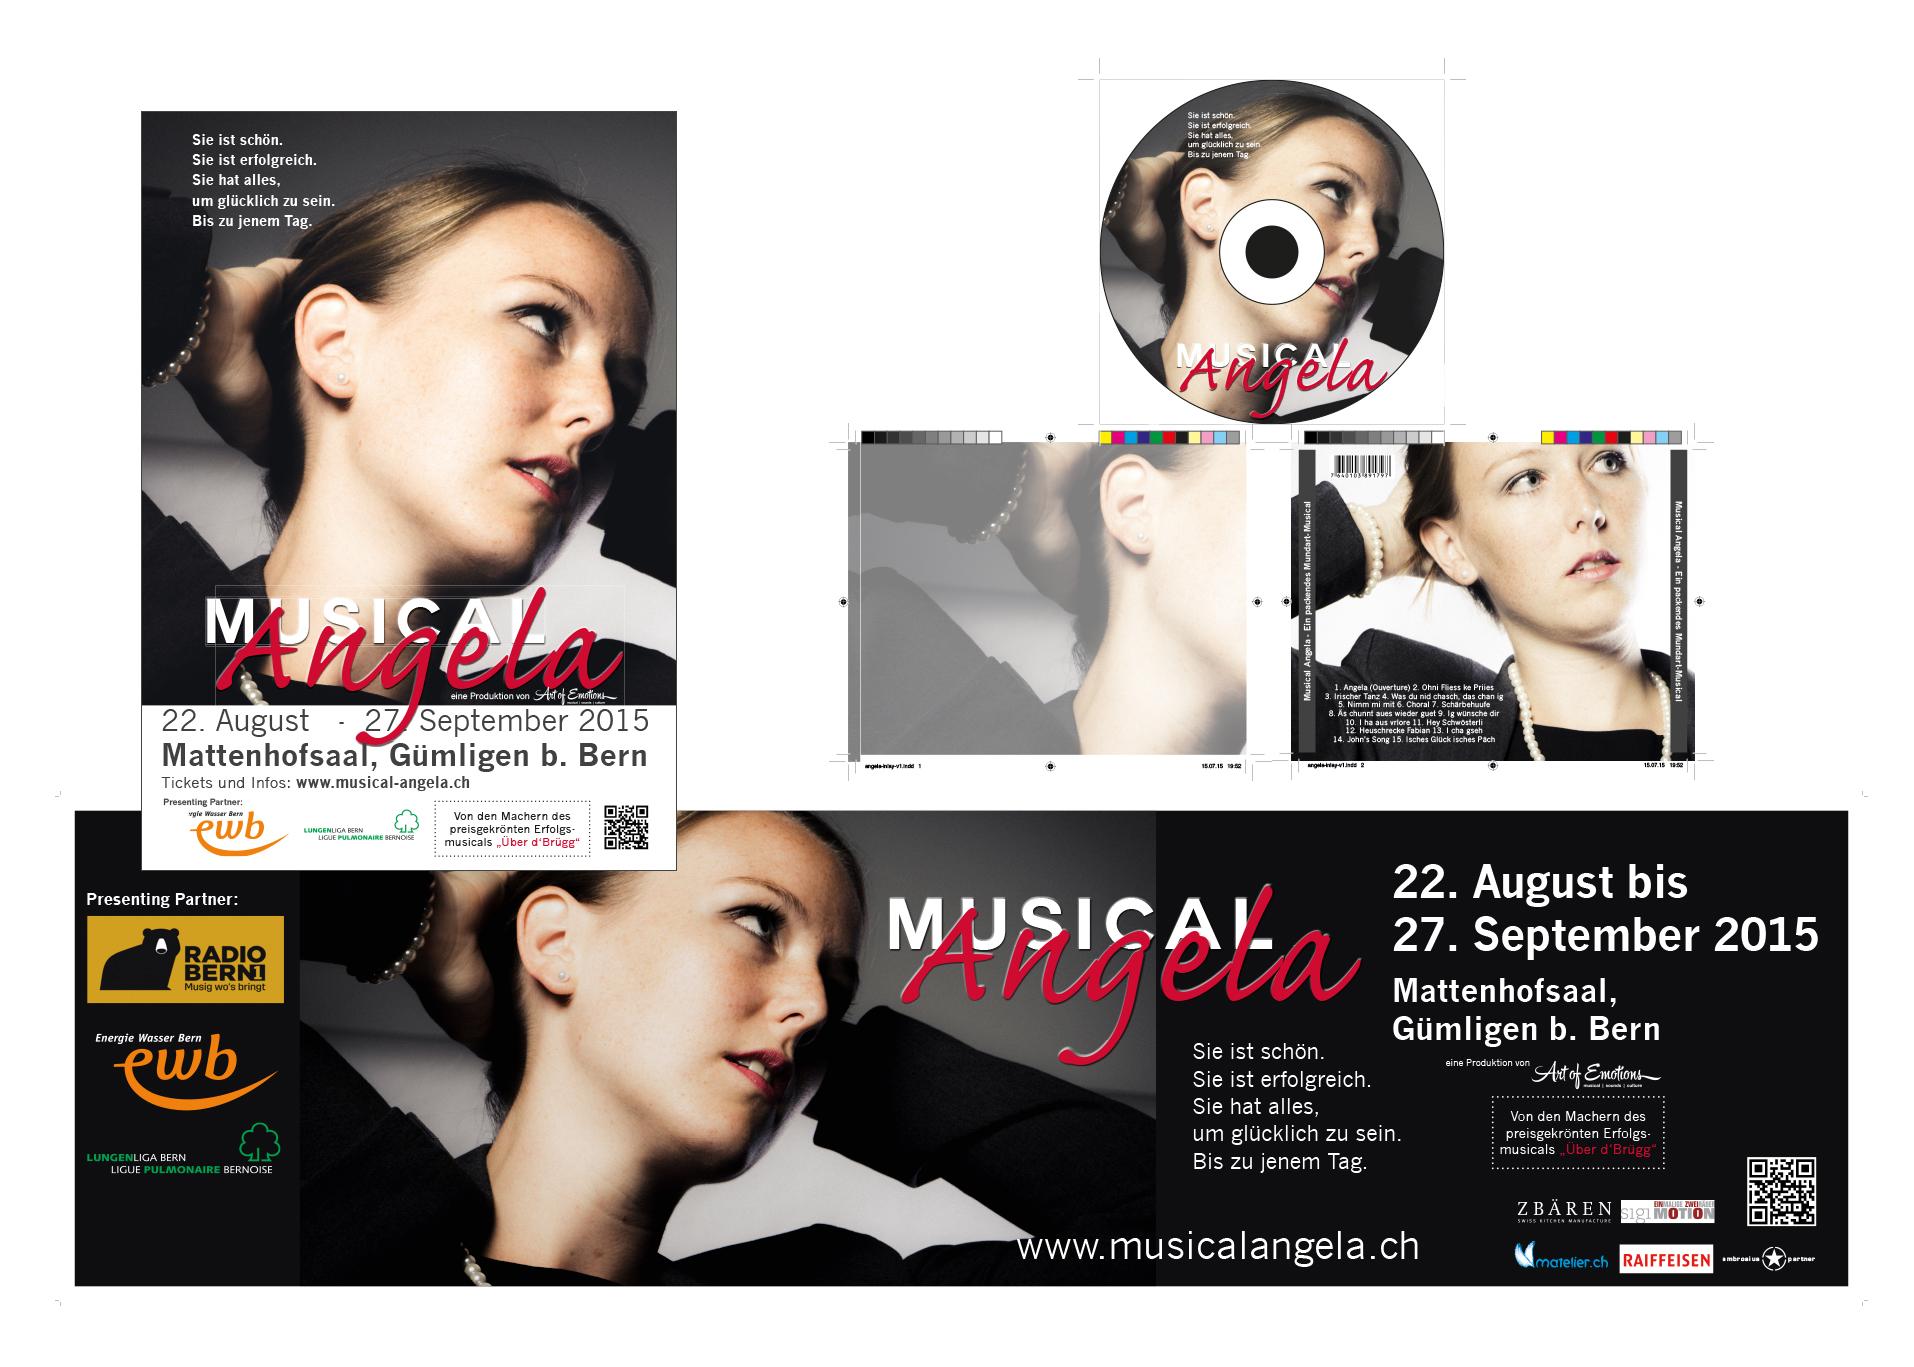 Musical Angela